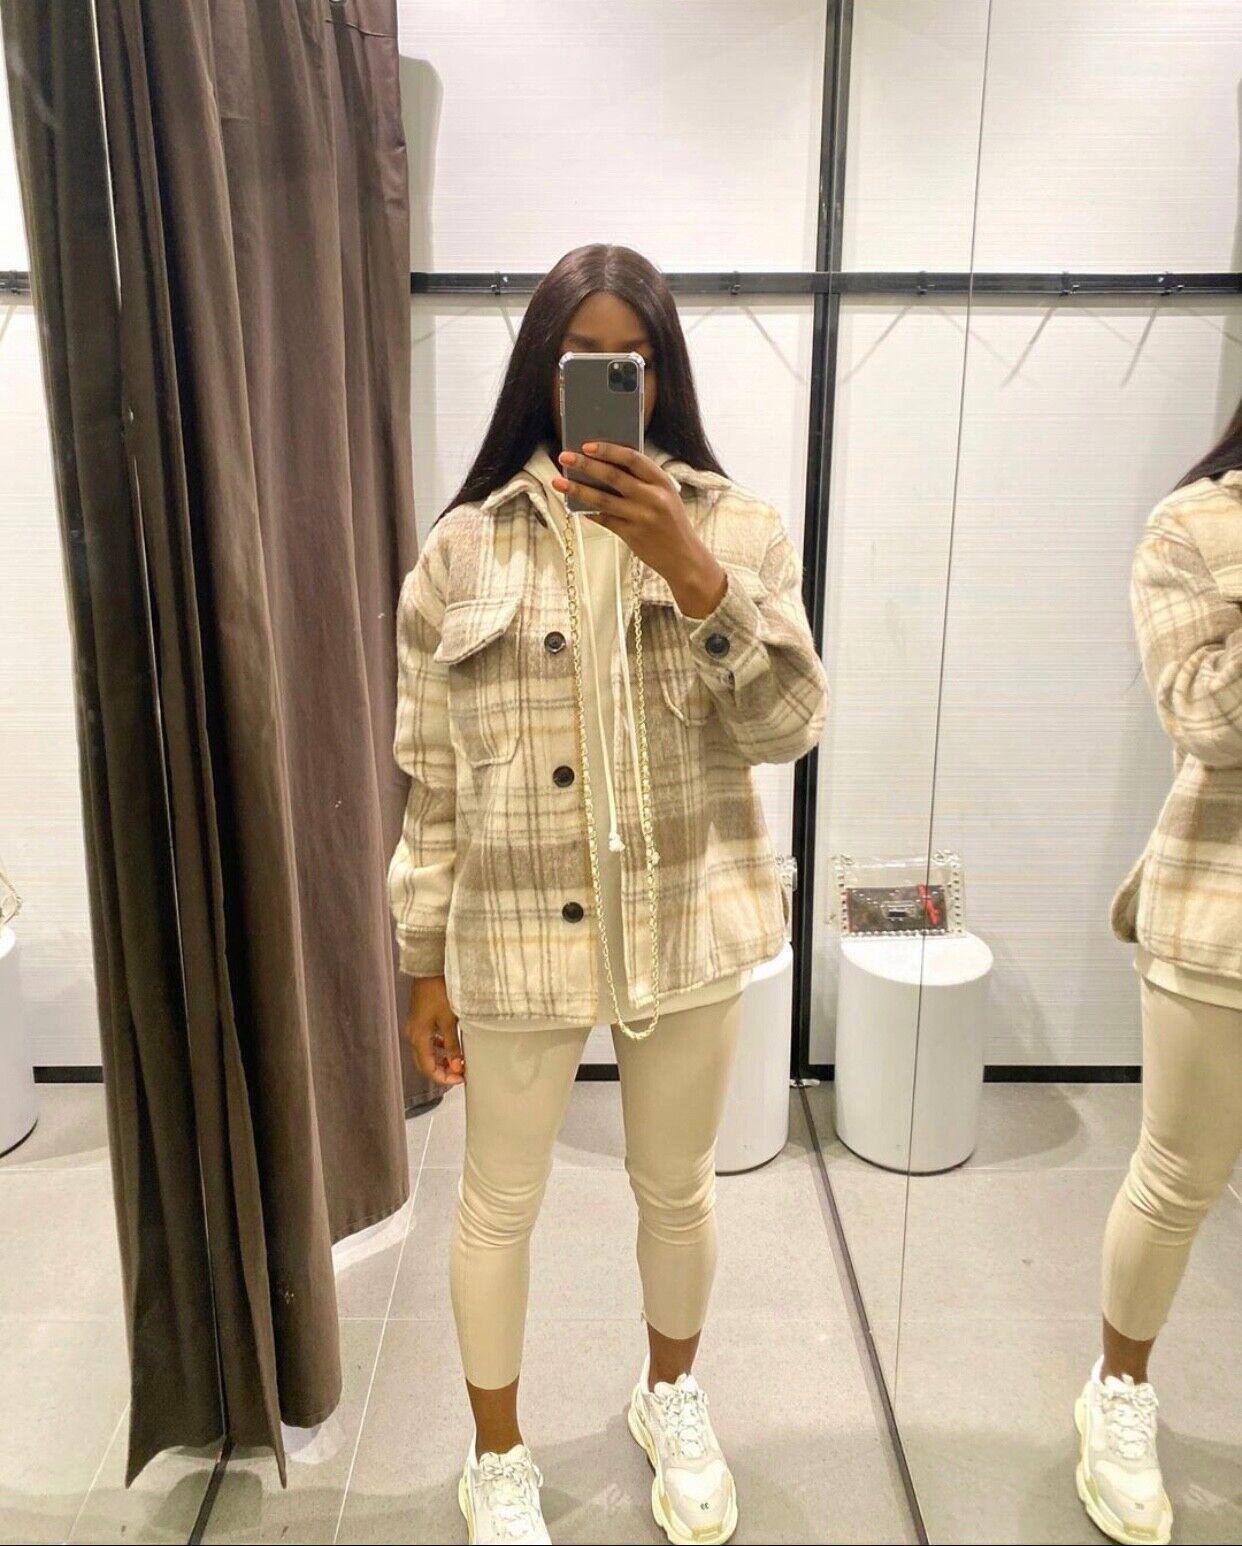 Bershka Plaid Woman's Oversized Overshirt Jacket Bloggers Favorite XS-S Sold Out